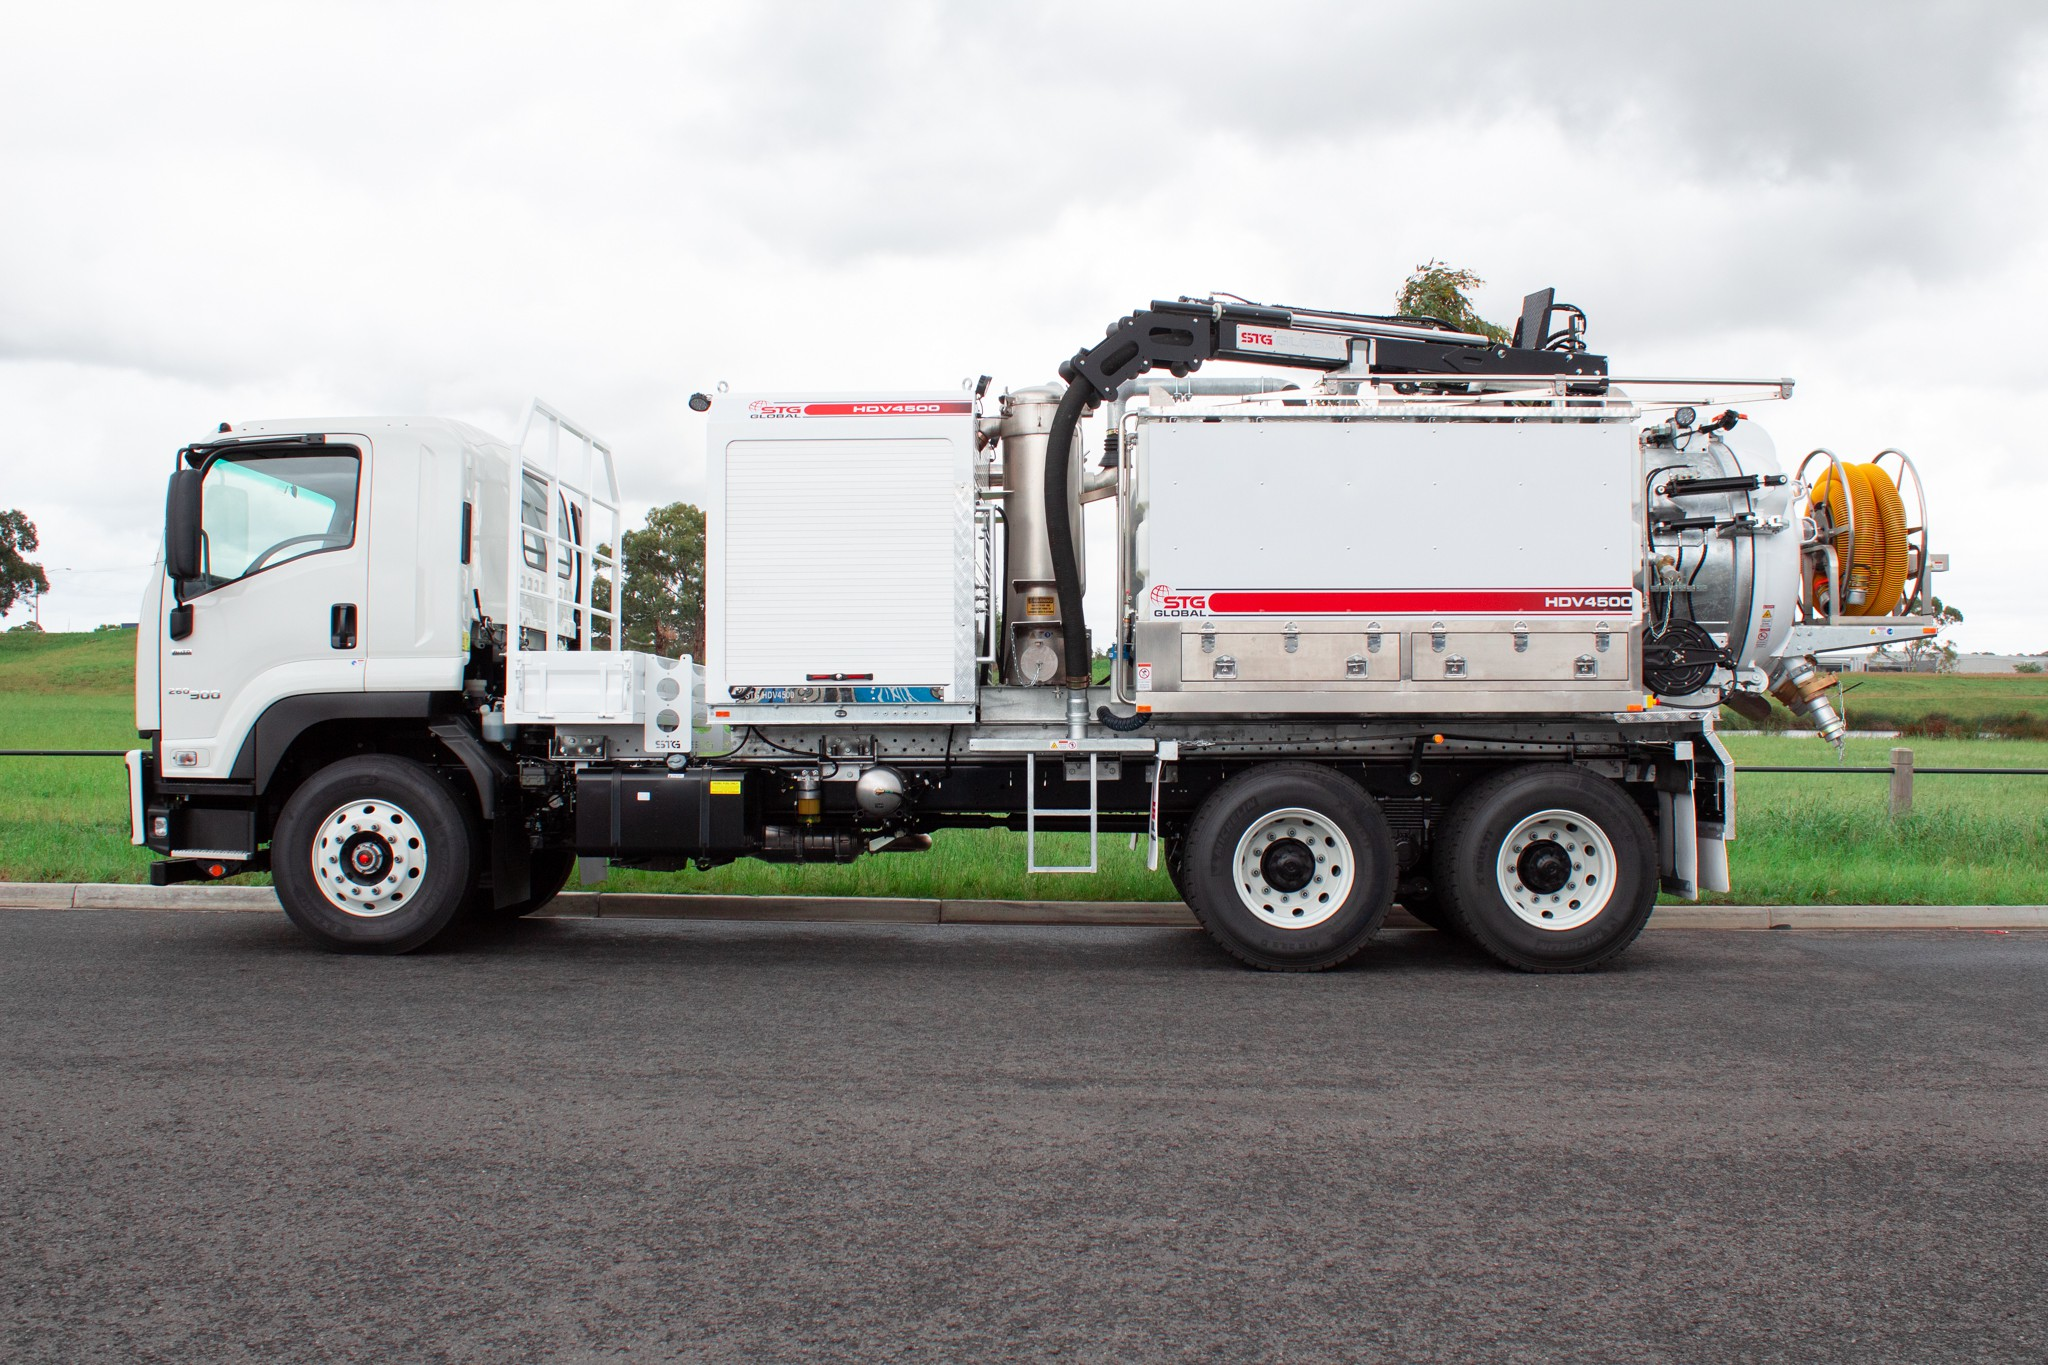 STG Global 2019 Isuzu FVZ260-300 Auto 6x4 4,500Lt Vac Truck for sale